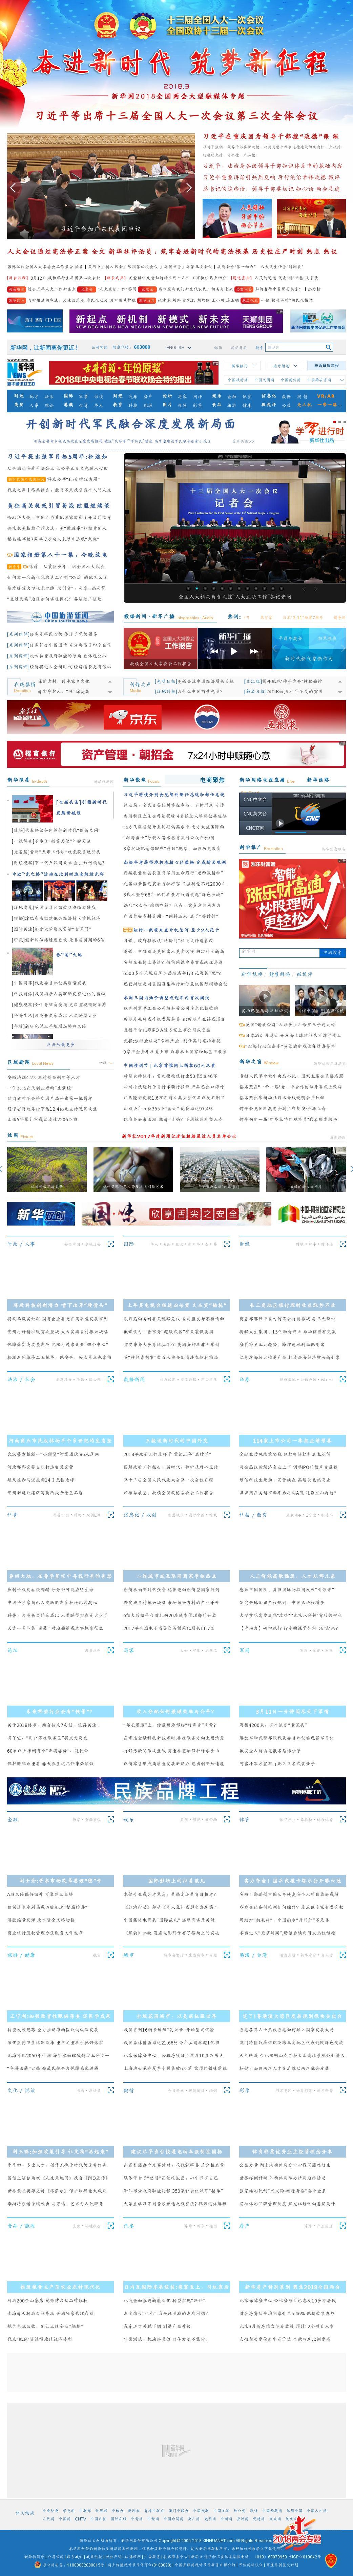 Xinhua at Monday March 12, 2018, 5:28 a.m. UTC